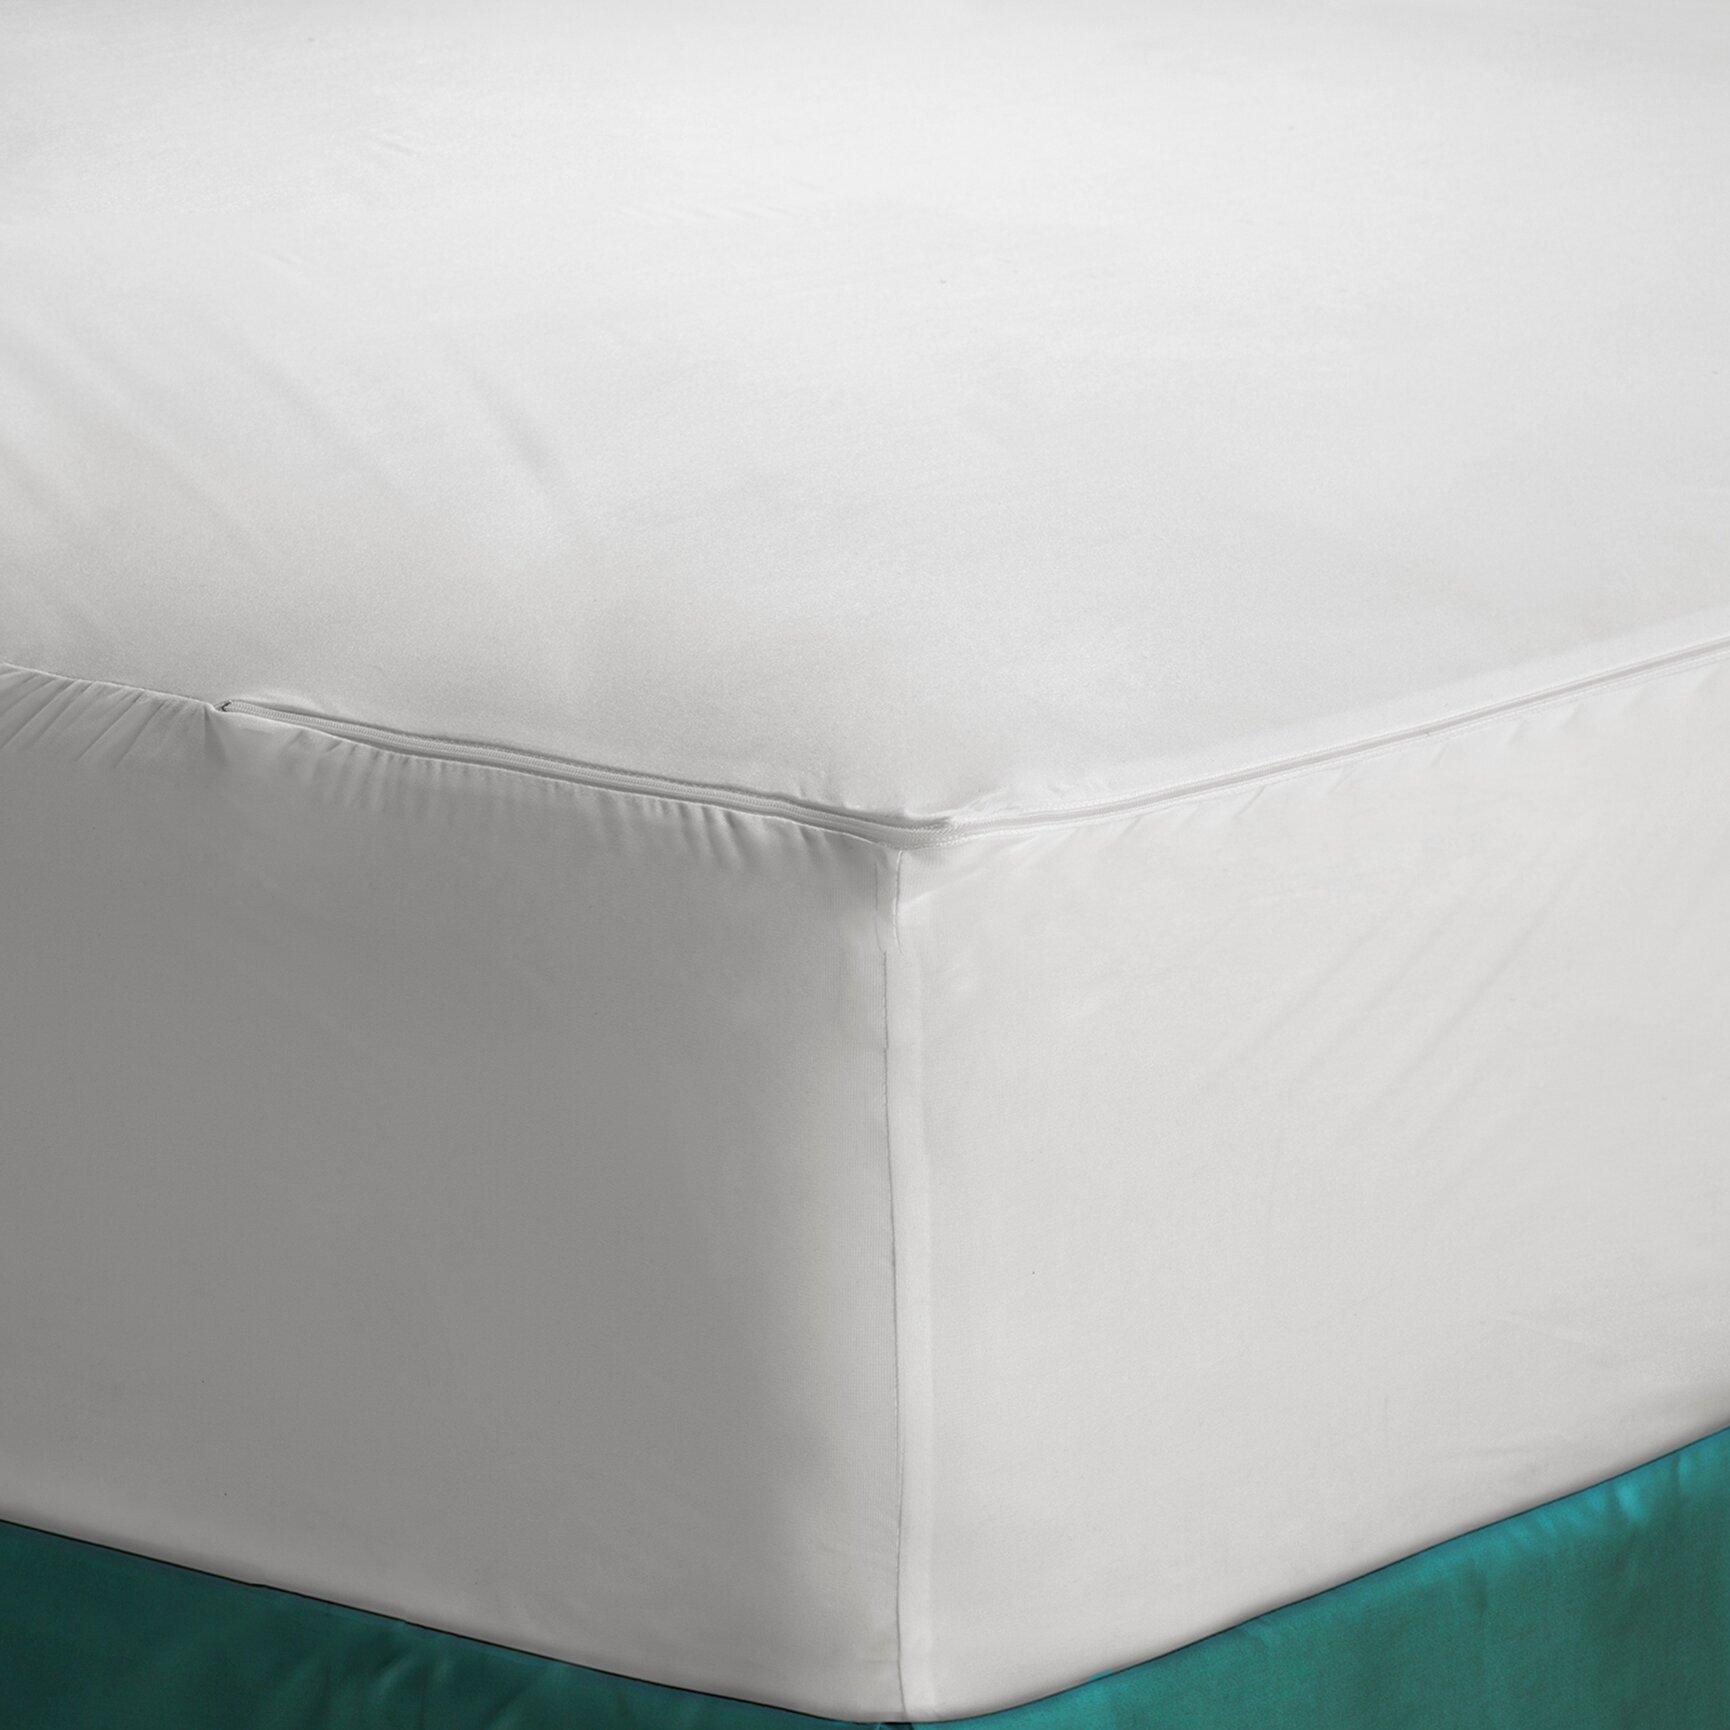 Allerease Allergy Zippered Waterproof Mattress Protector